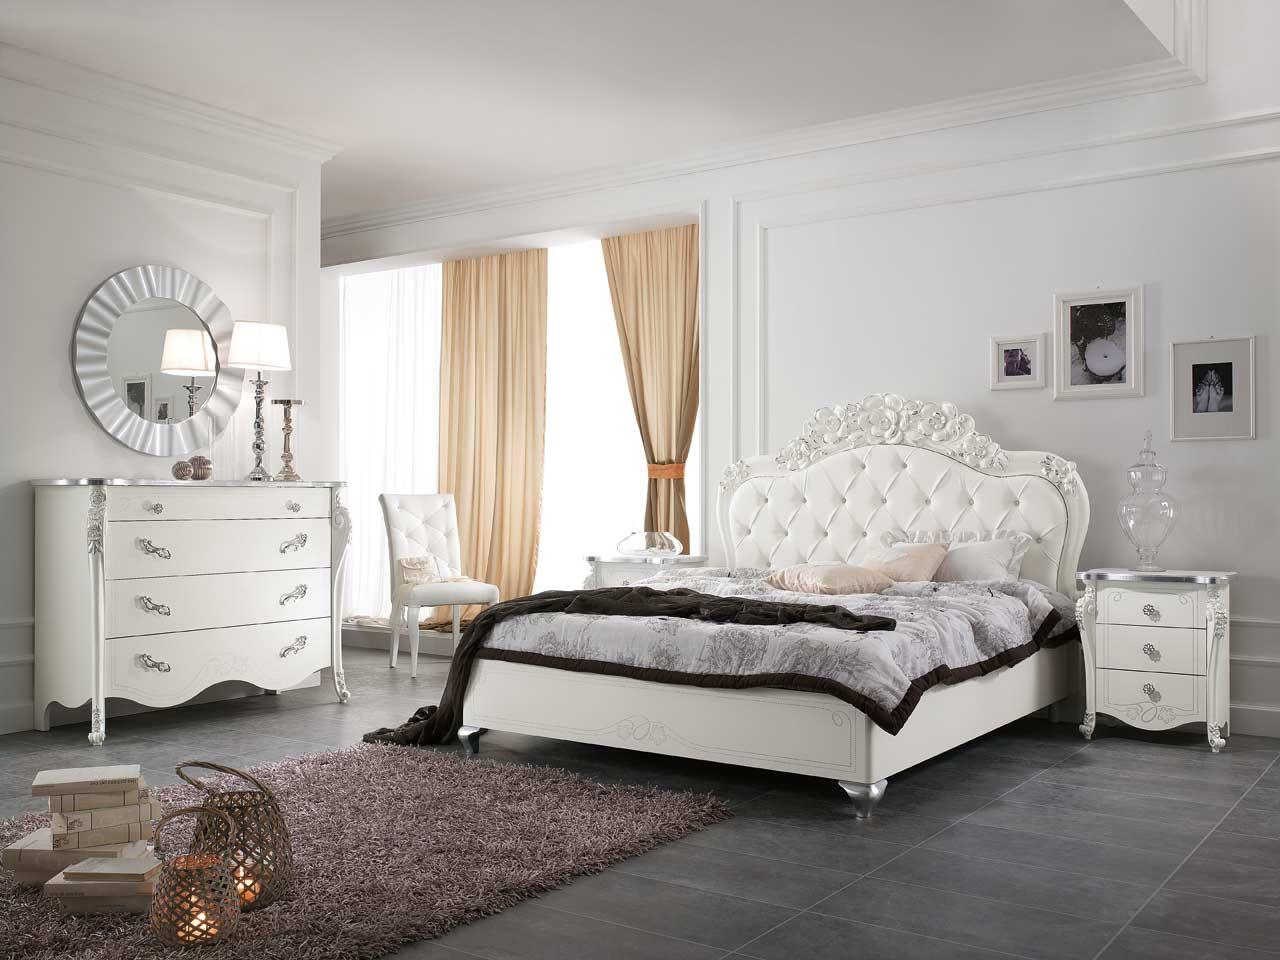 Mobilpi - Arredamenti camere da letto ...